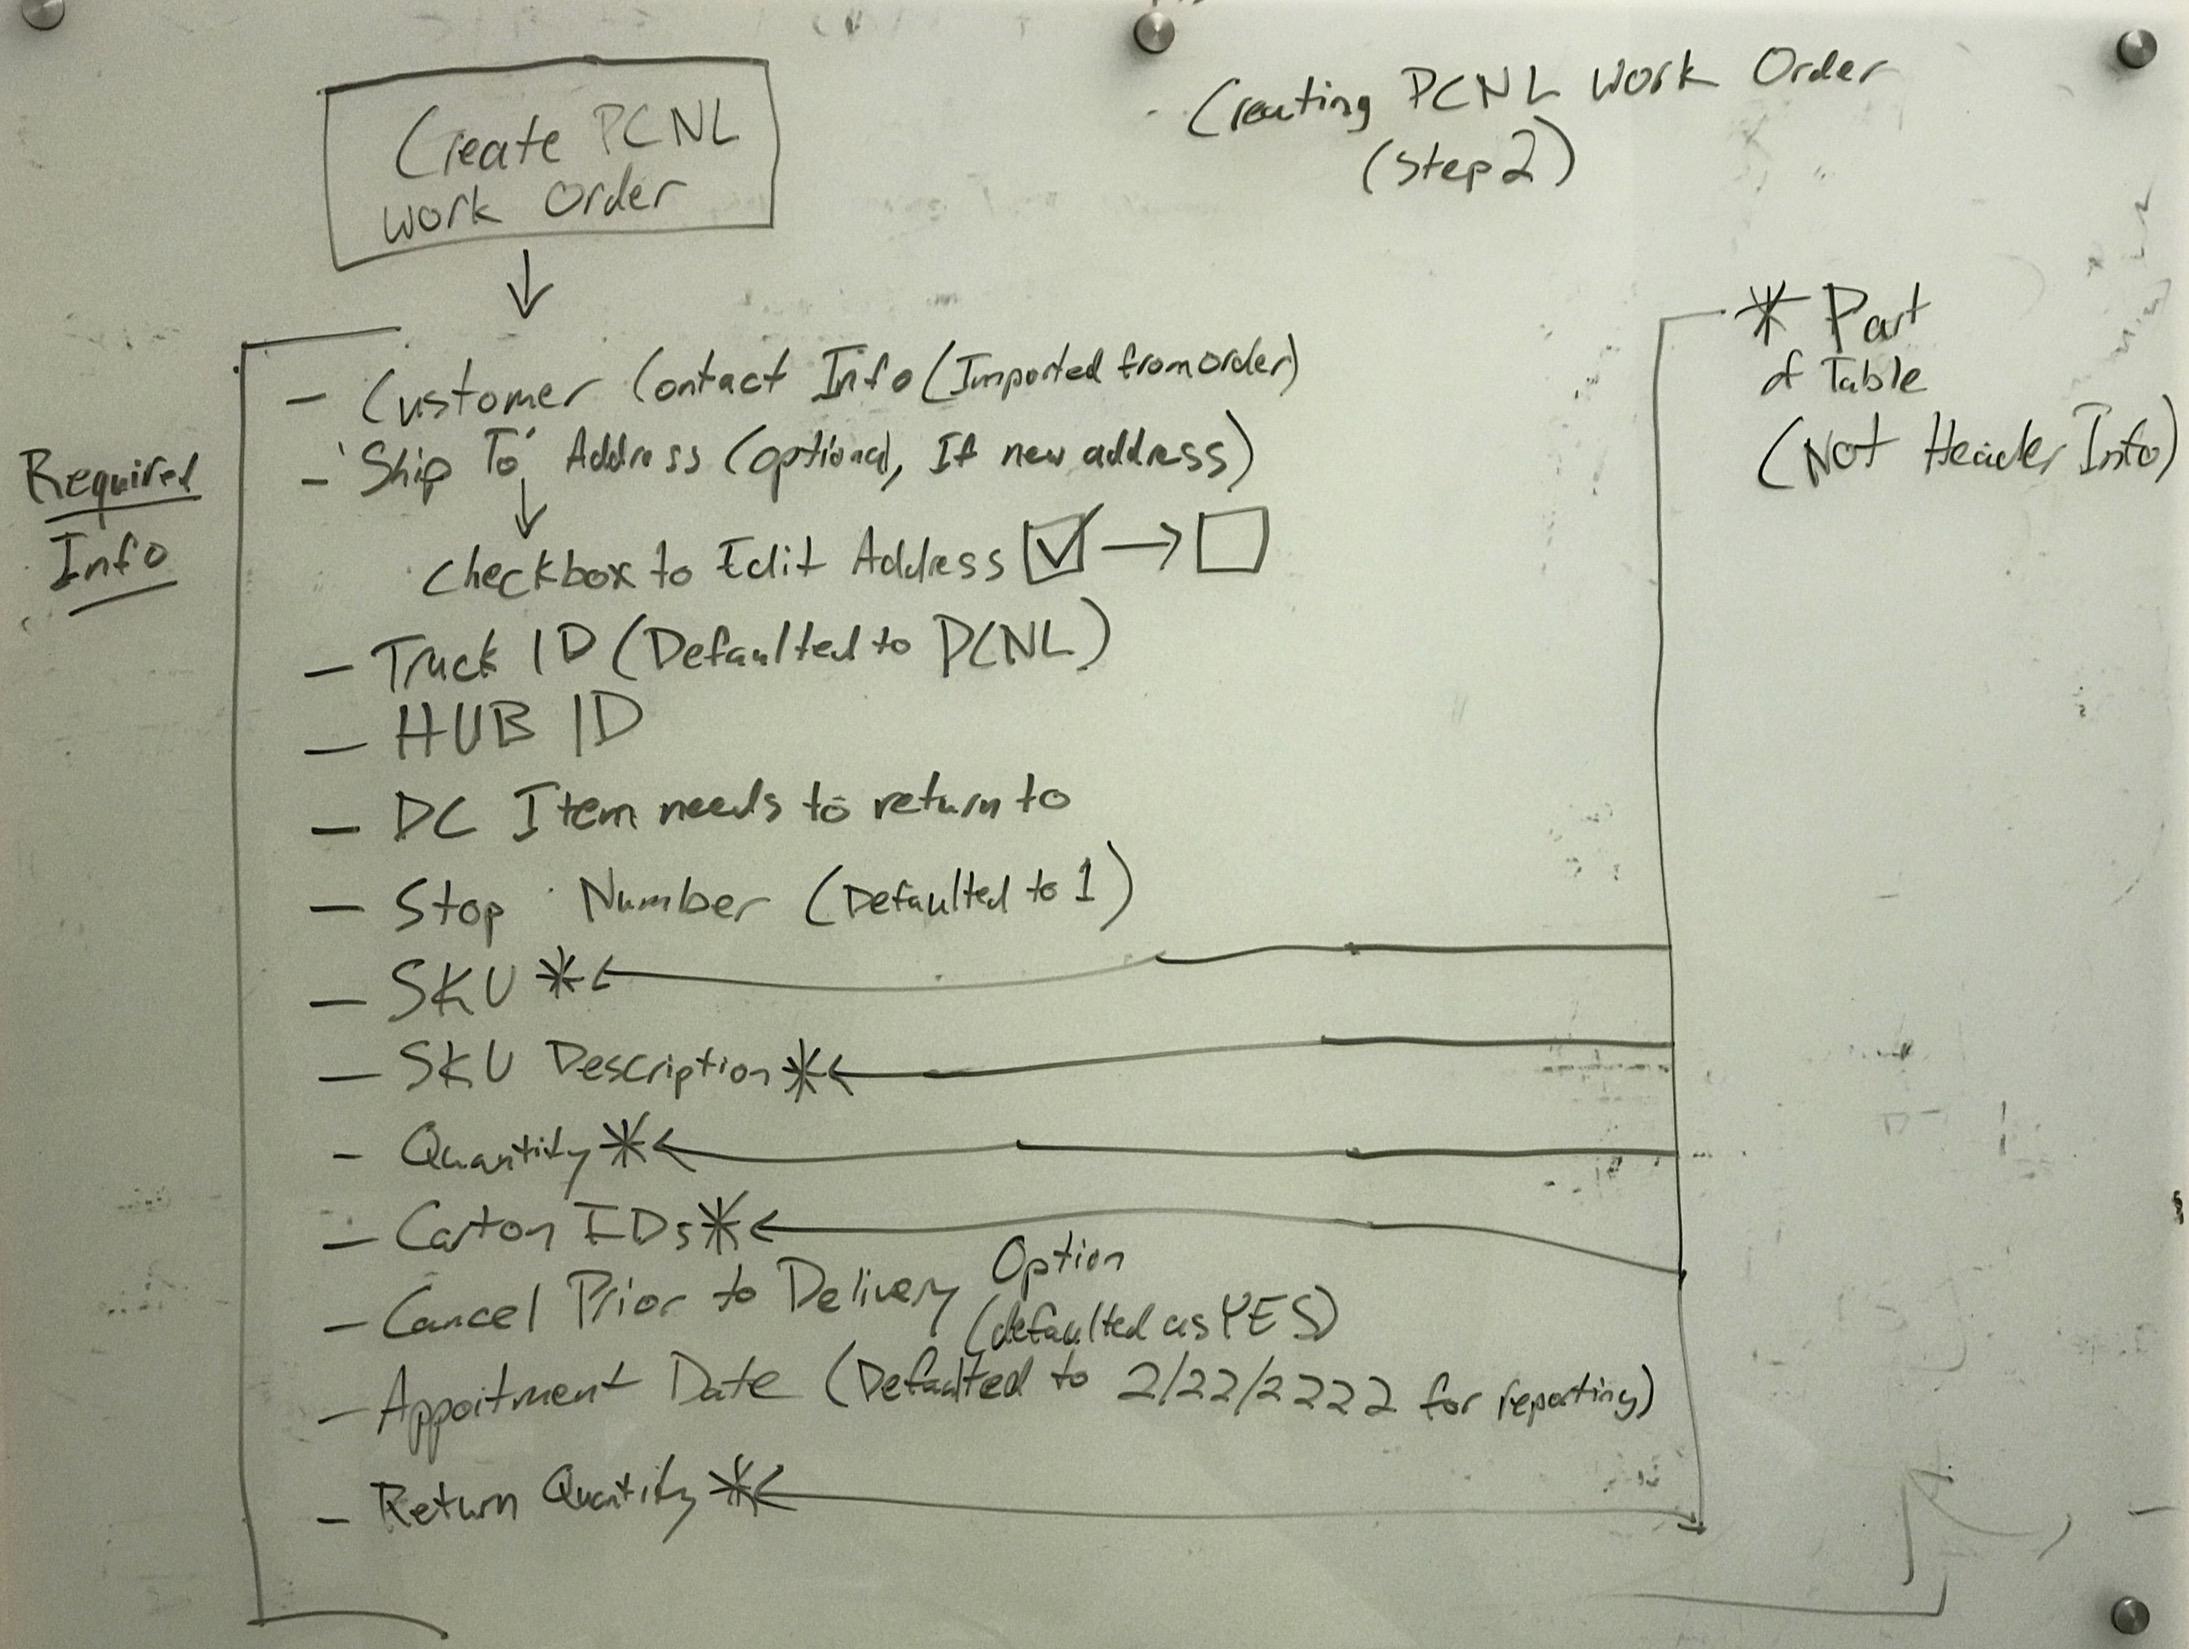 Creating PCNL Work Order (step 2)